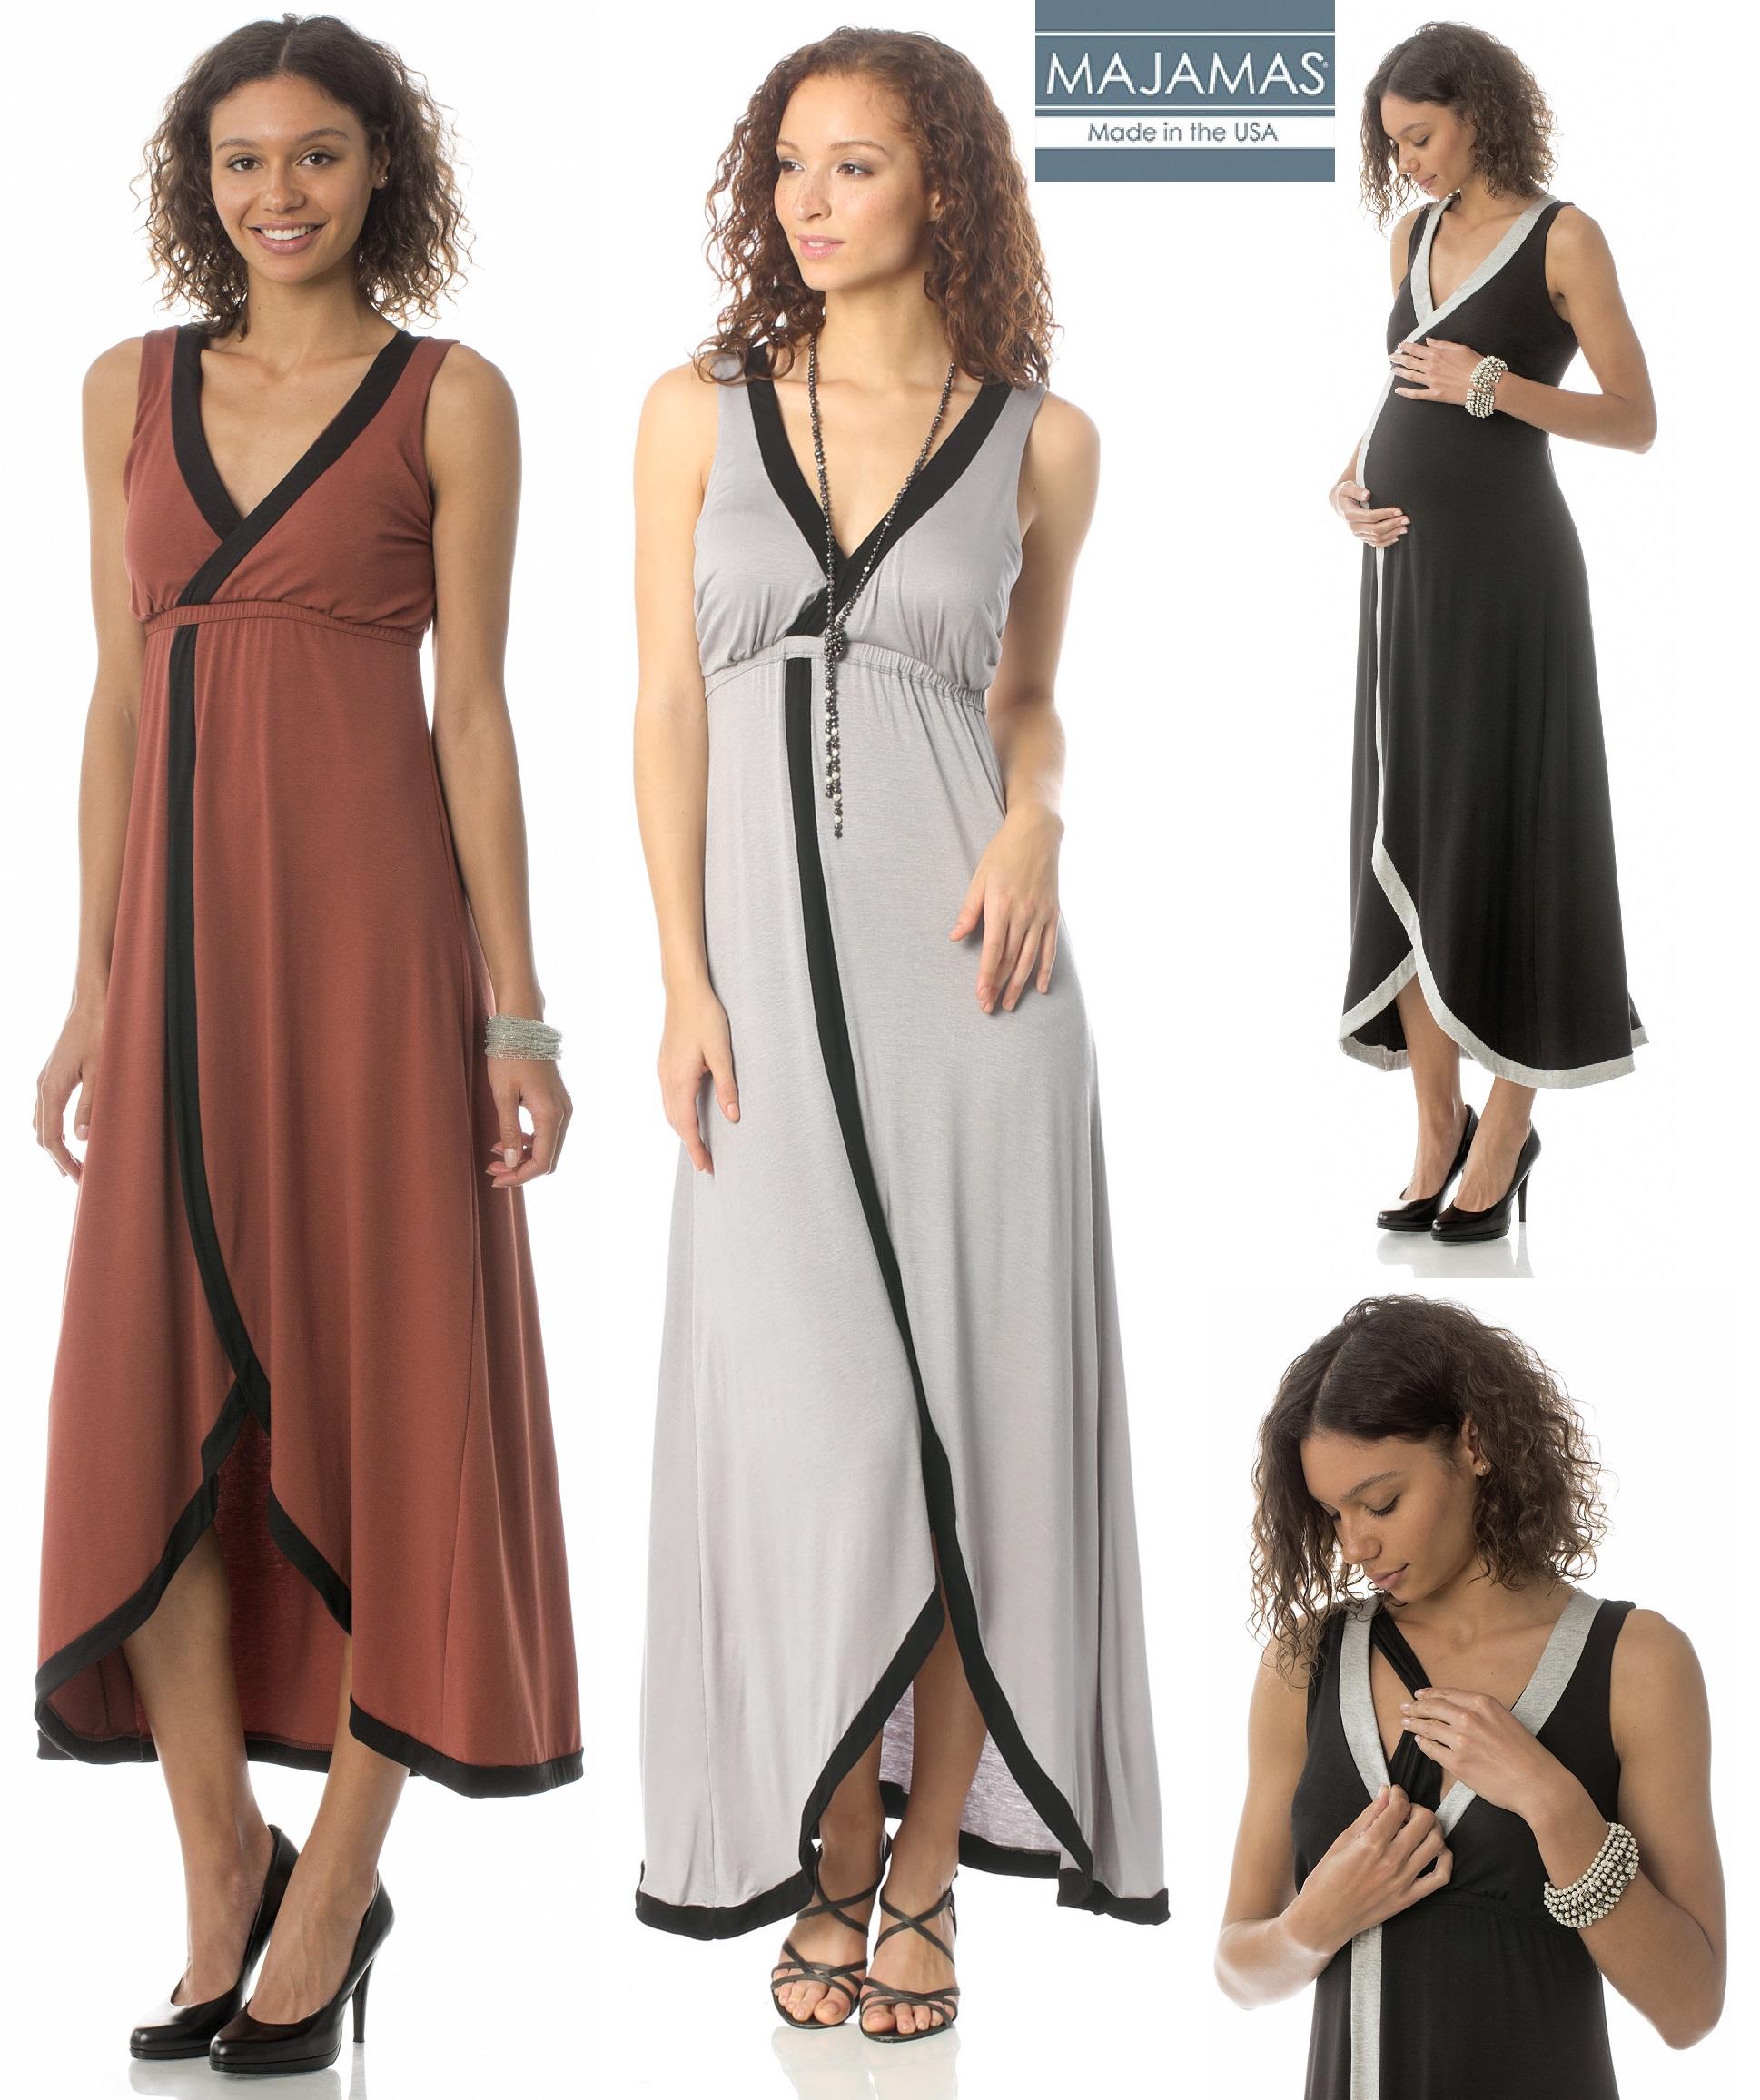 majamas-dream-nursing-dress-all